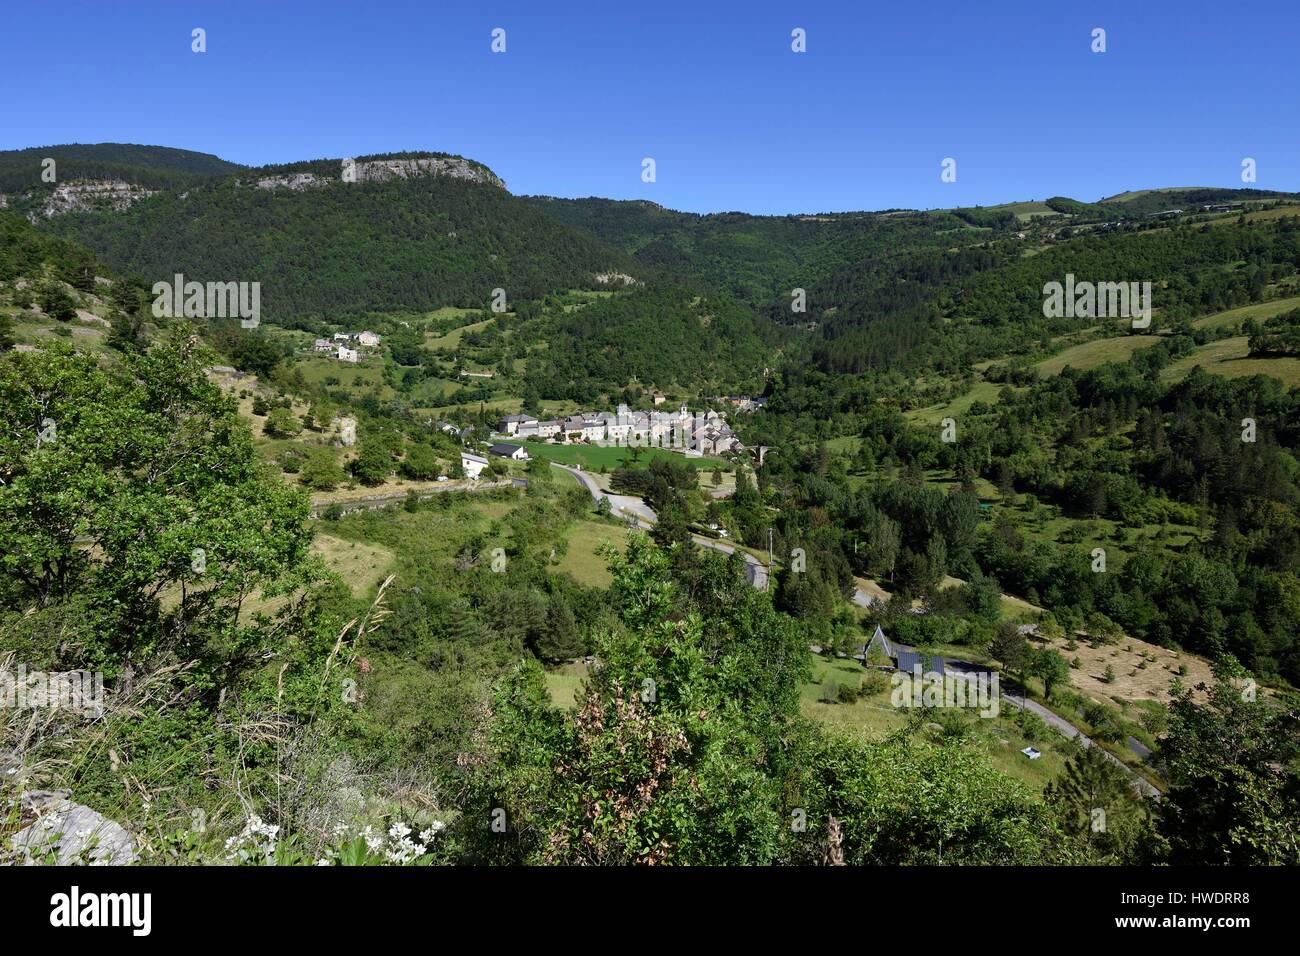 France, Gard, Treves, Gorges of Trevezel, Rocher du Regard, the village - Stock Image